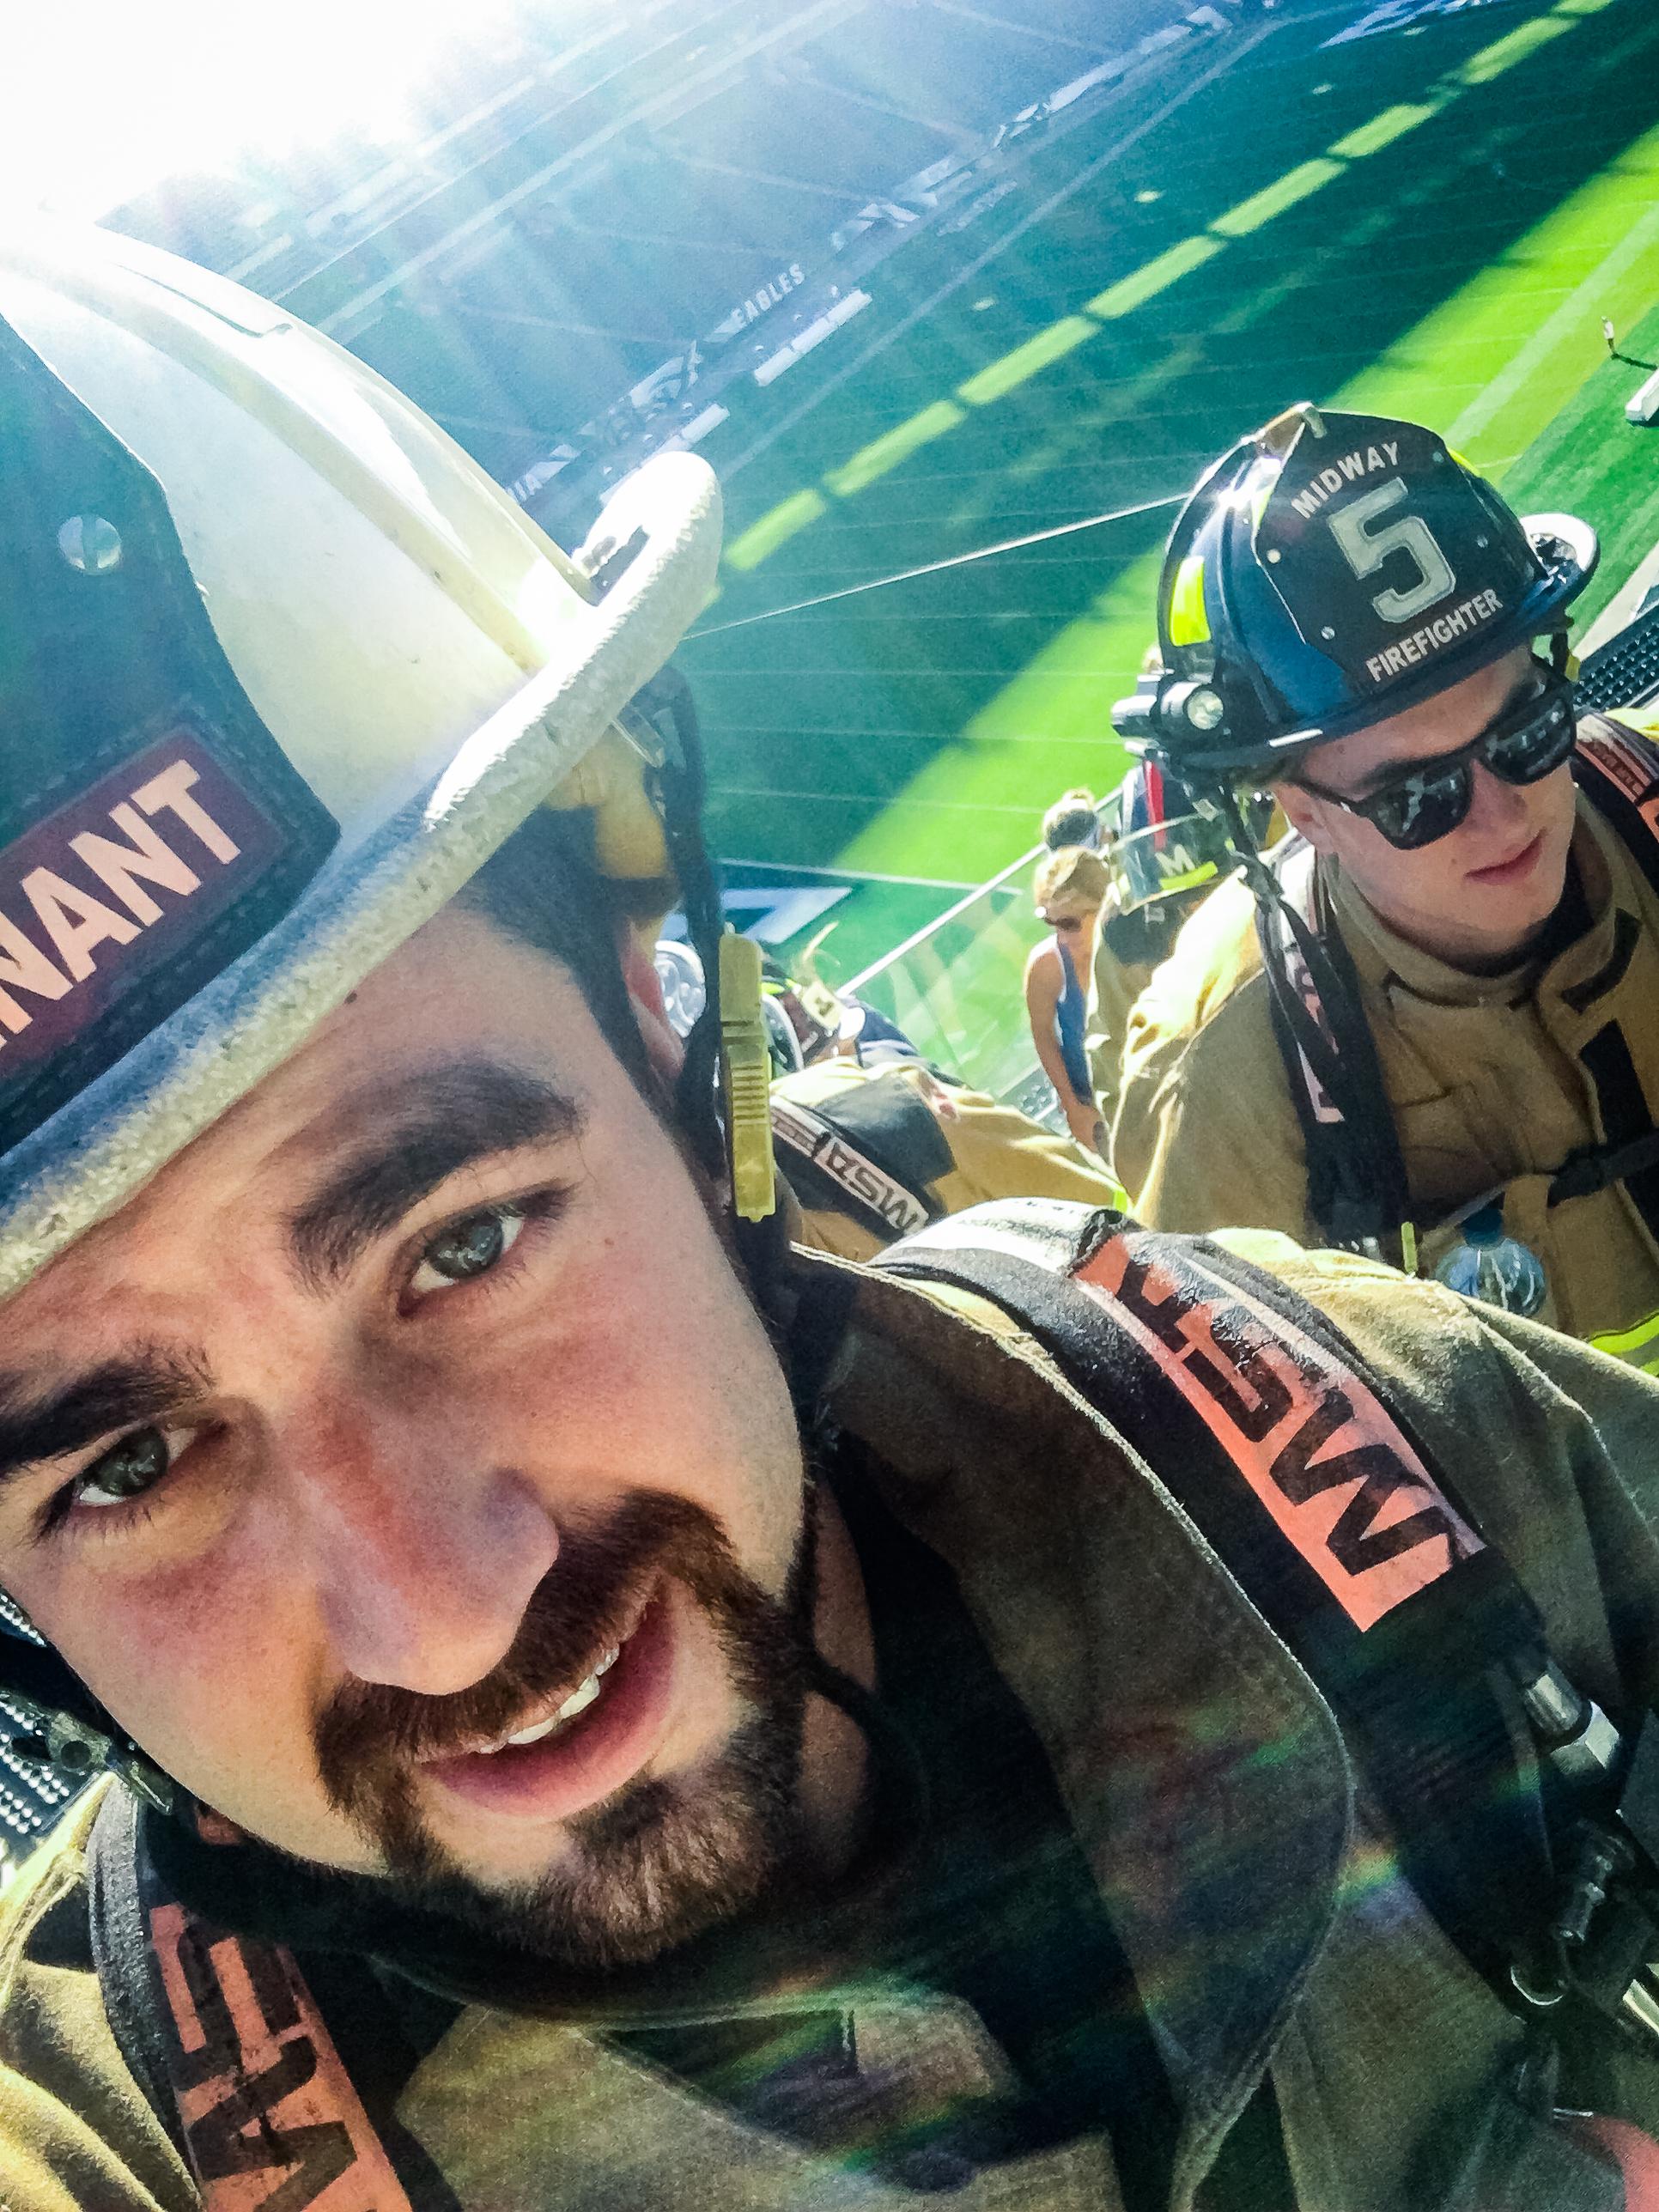 20170923 -911 Stair Climb - IMG_7764.jpg